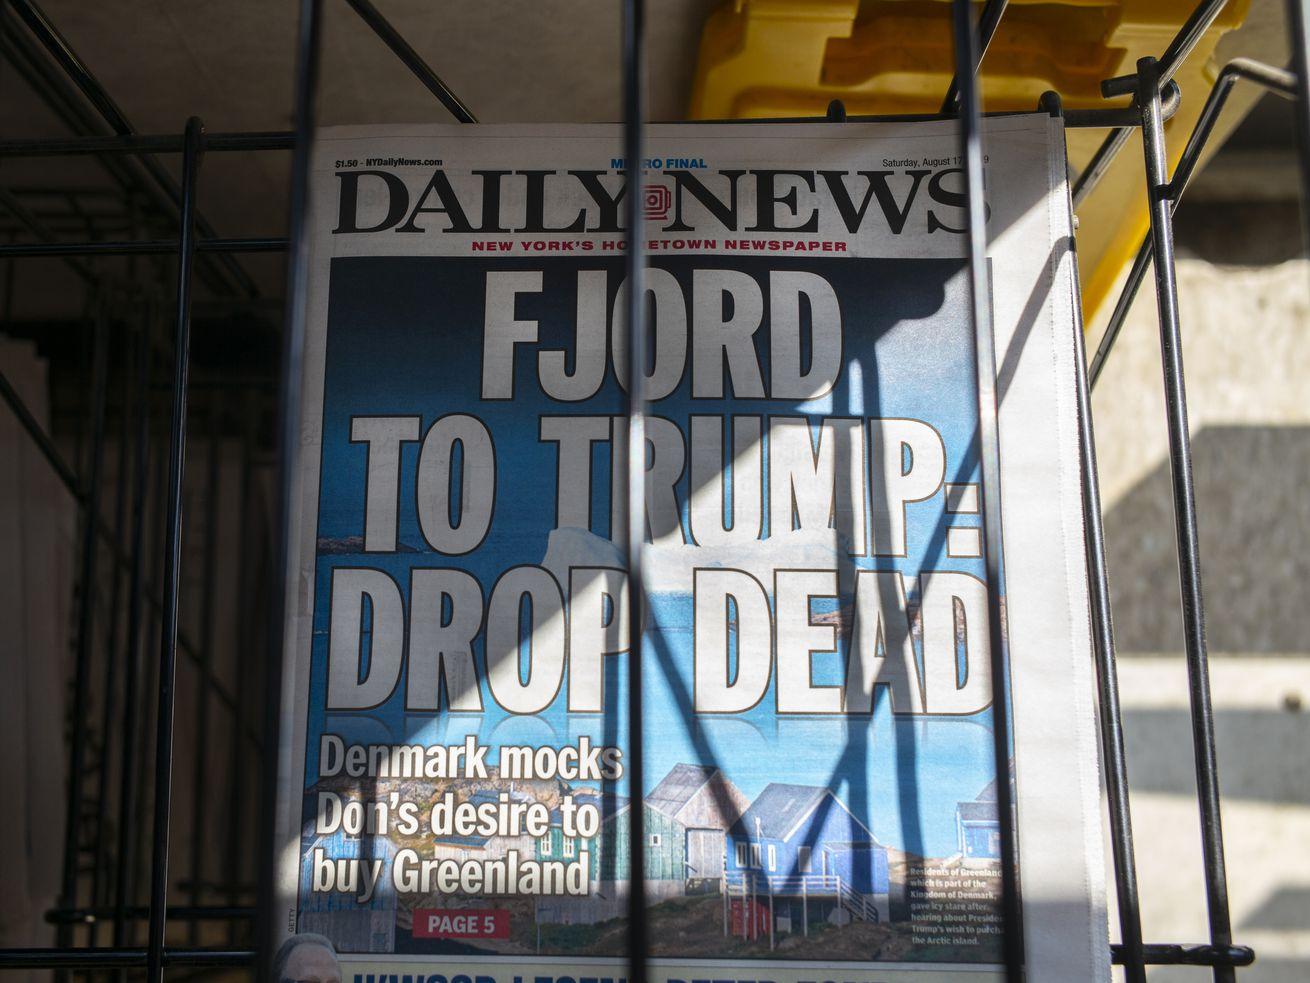 Daily News Headline Critical Of President Donald Trump